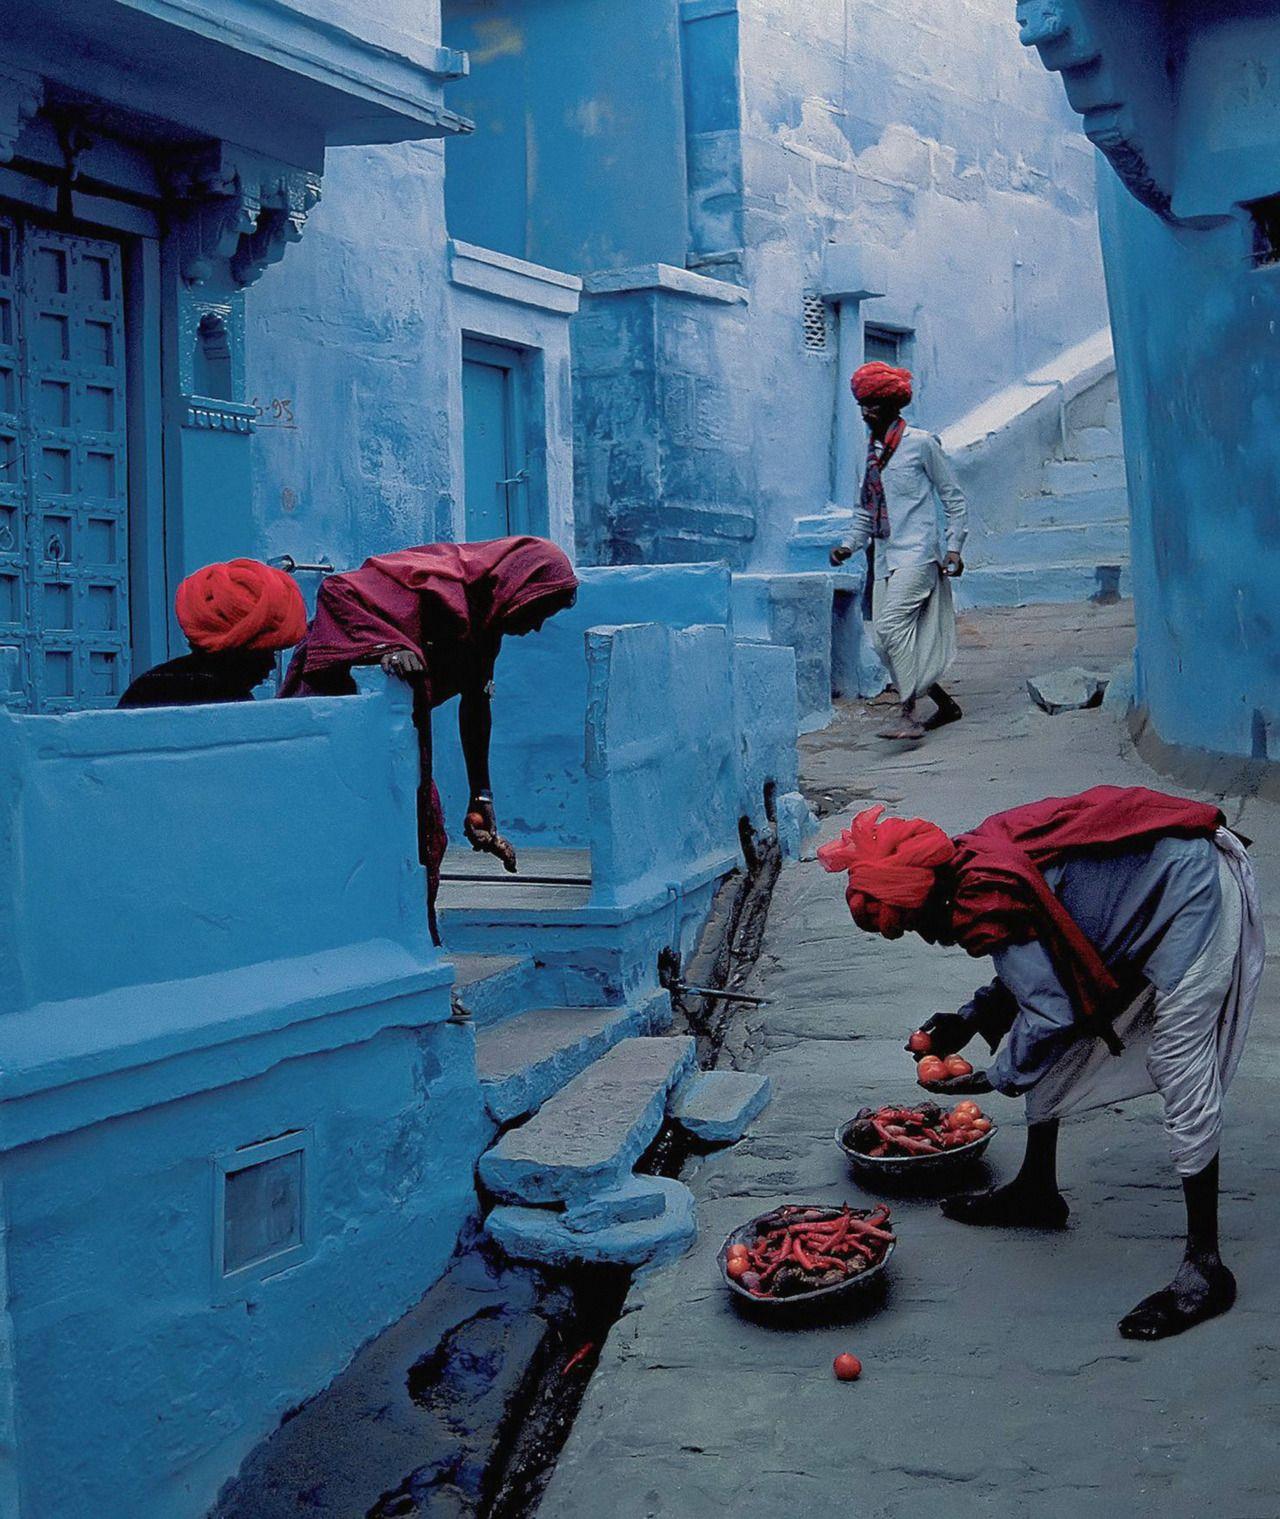 Image by Steve Mcurry #jodhpur #rajasthan #india | india